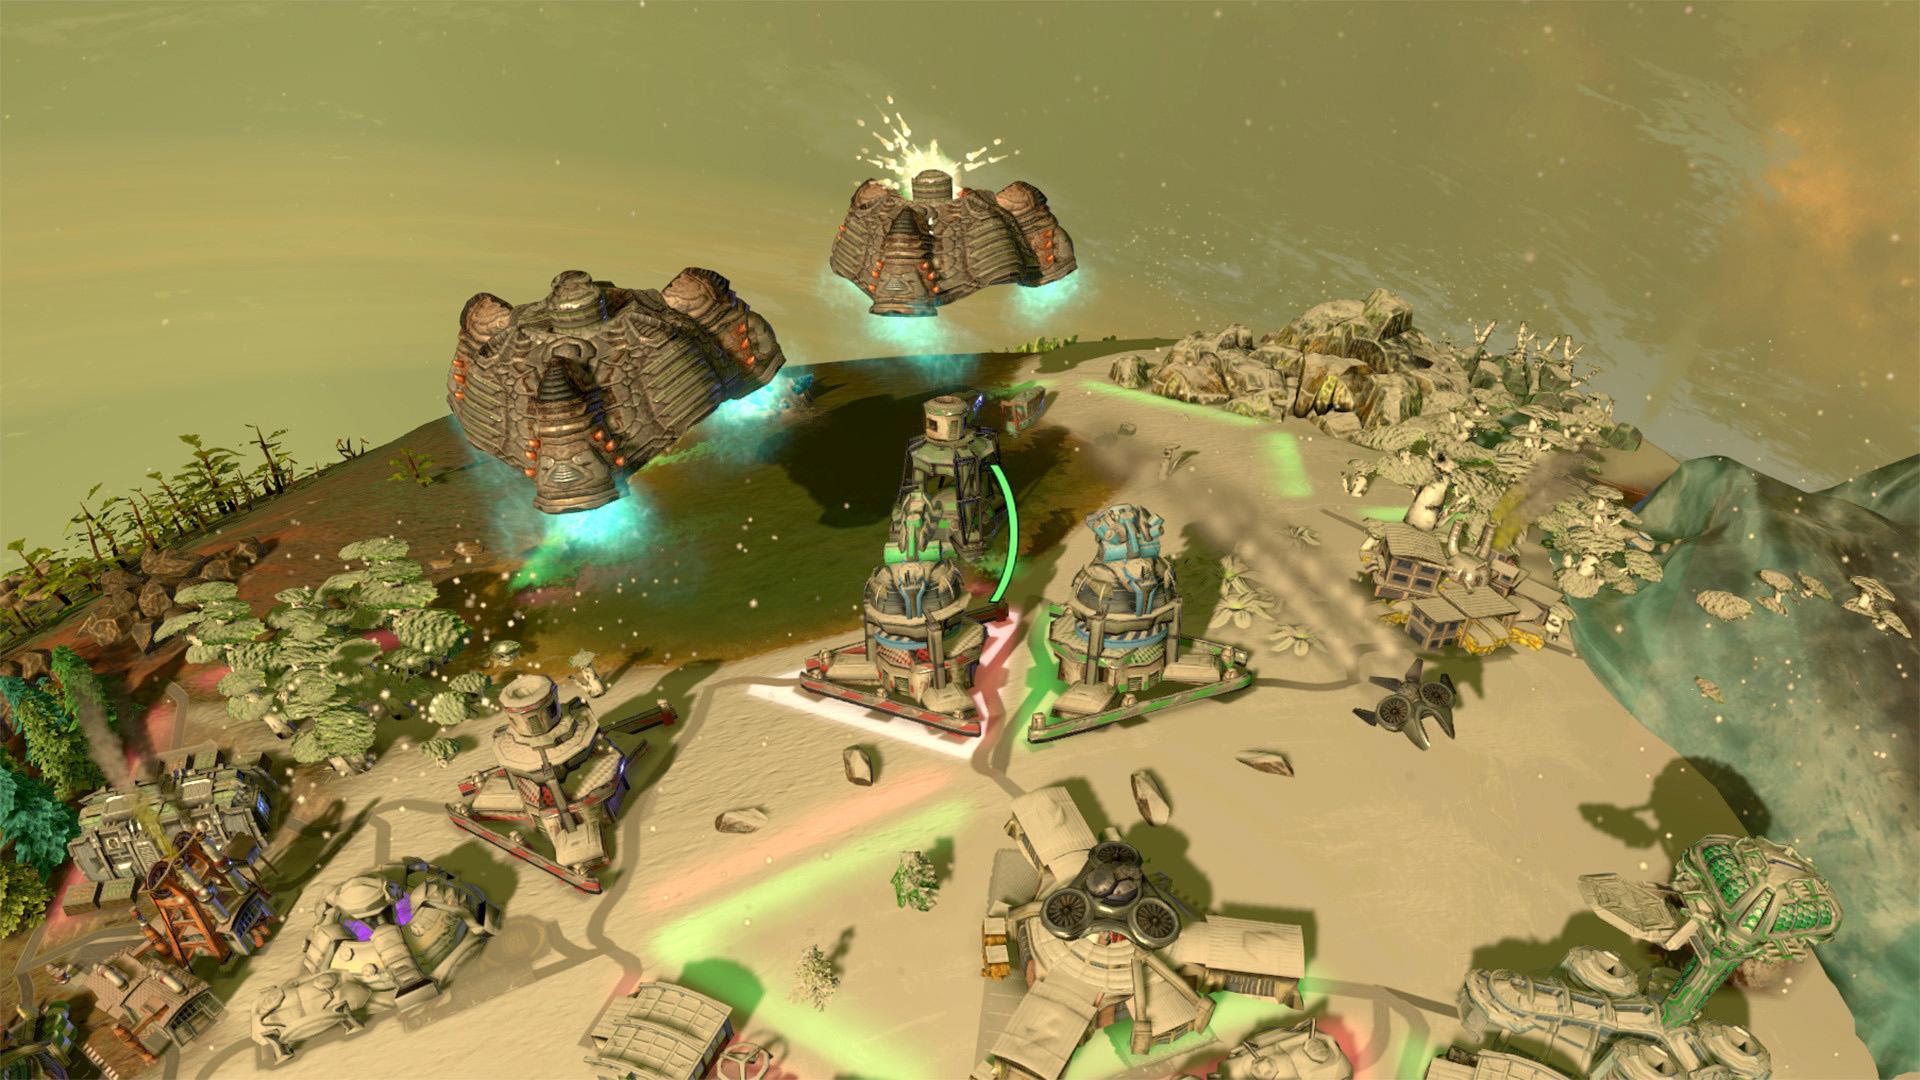 "Eine Szene aus dem Computerspiel ""Imagine Earth"". Bild: Imagine Earth/ Serious Brothers"